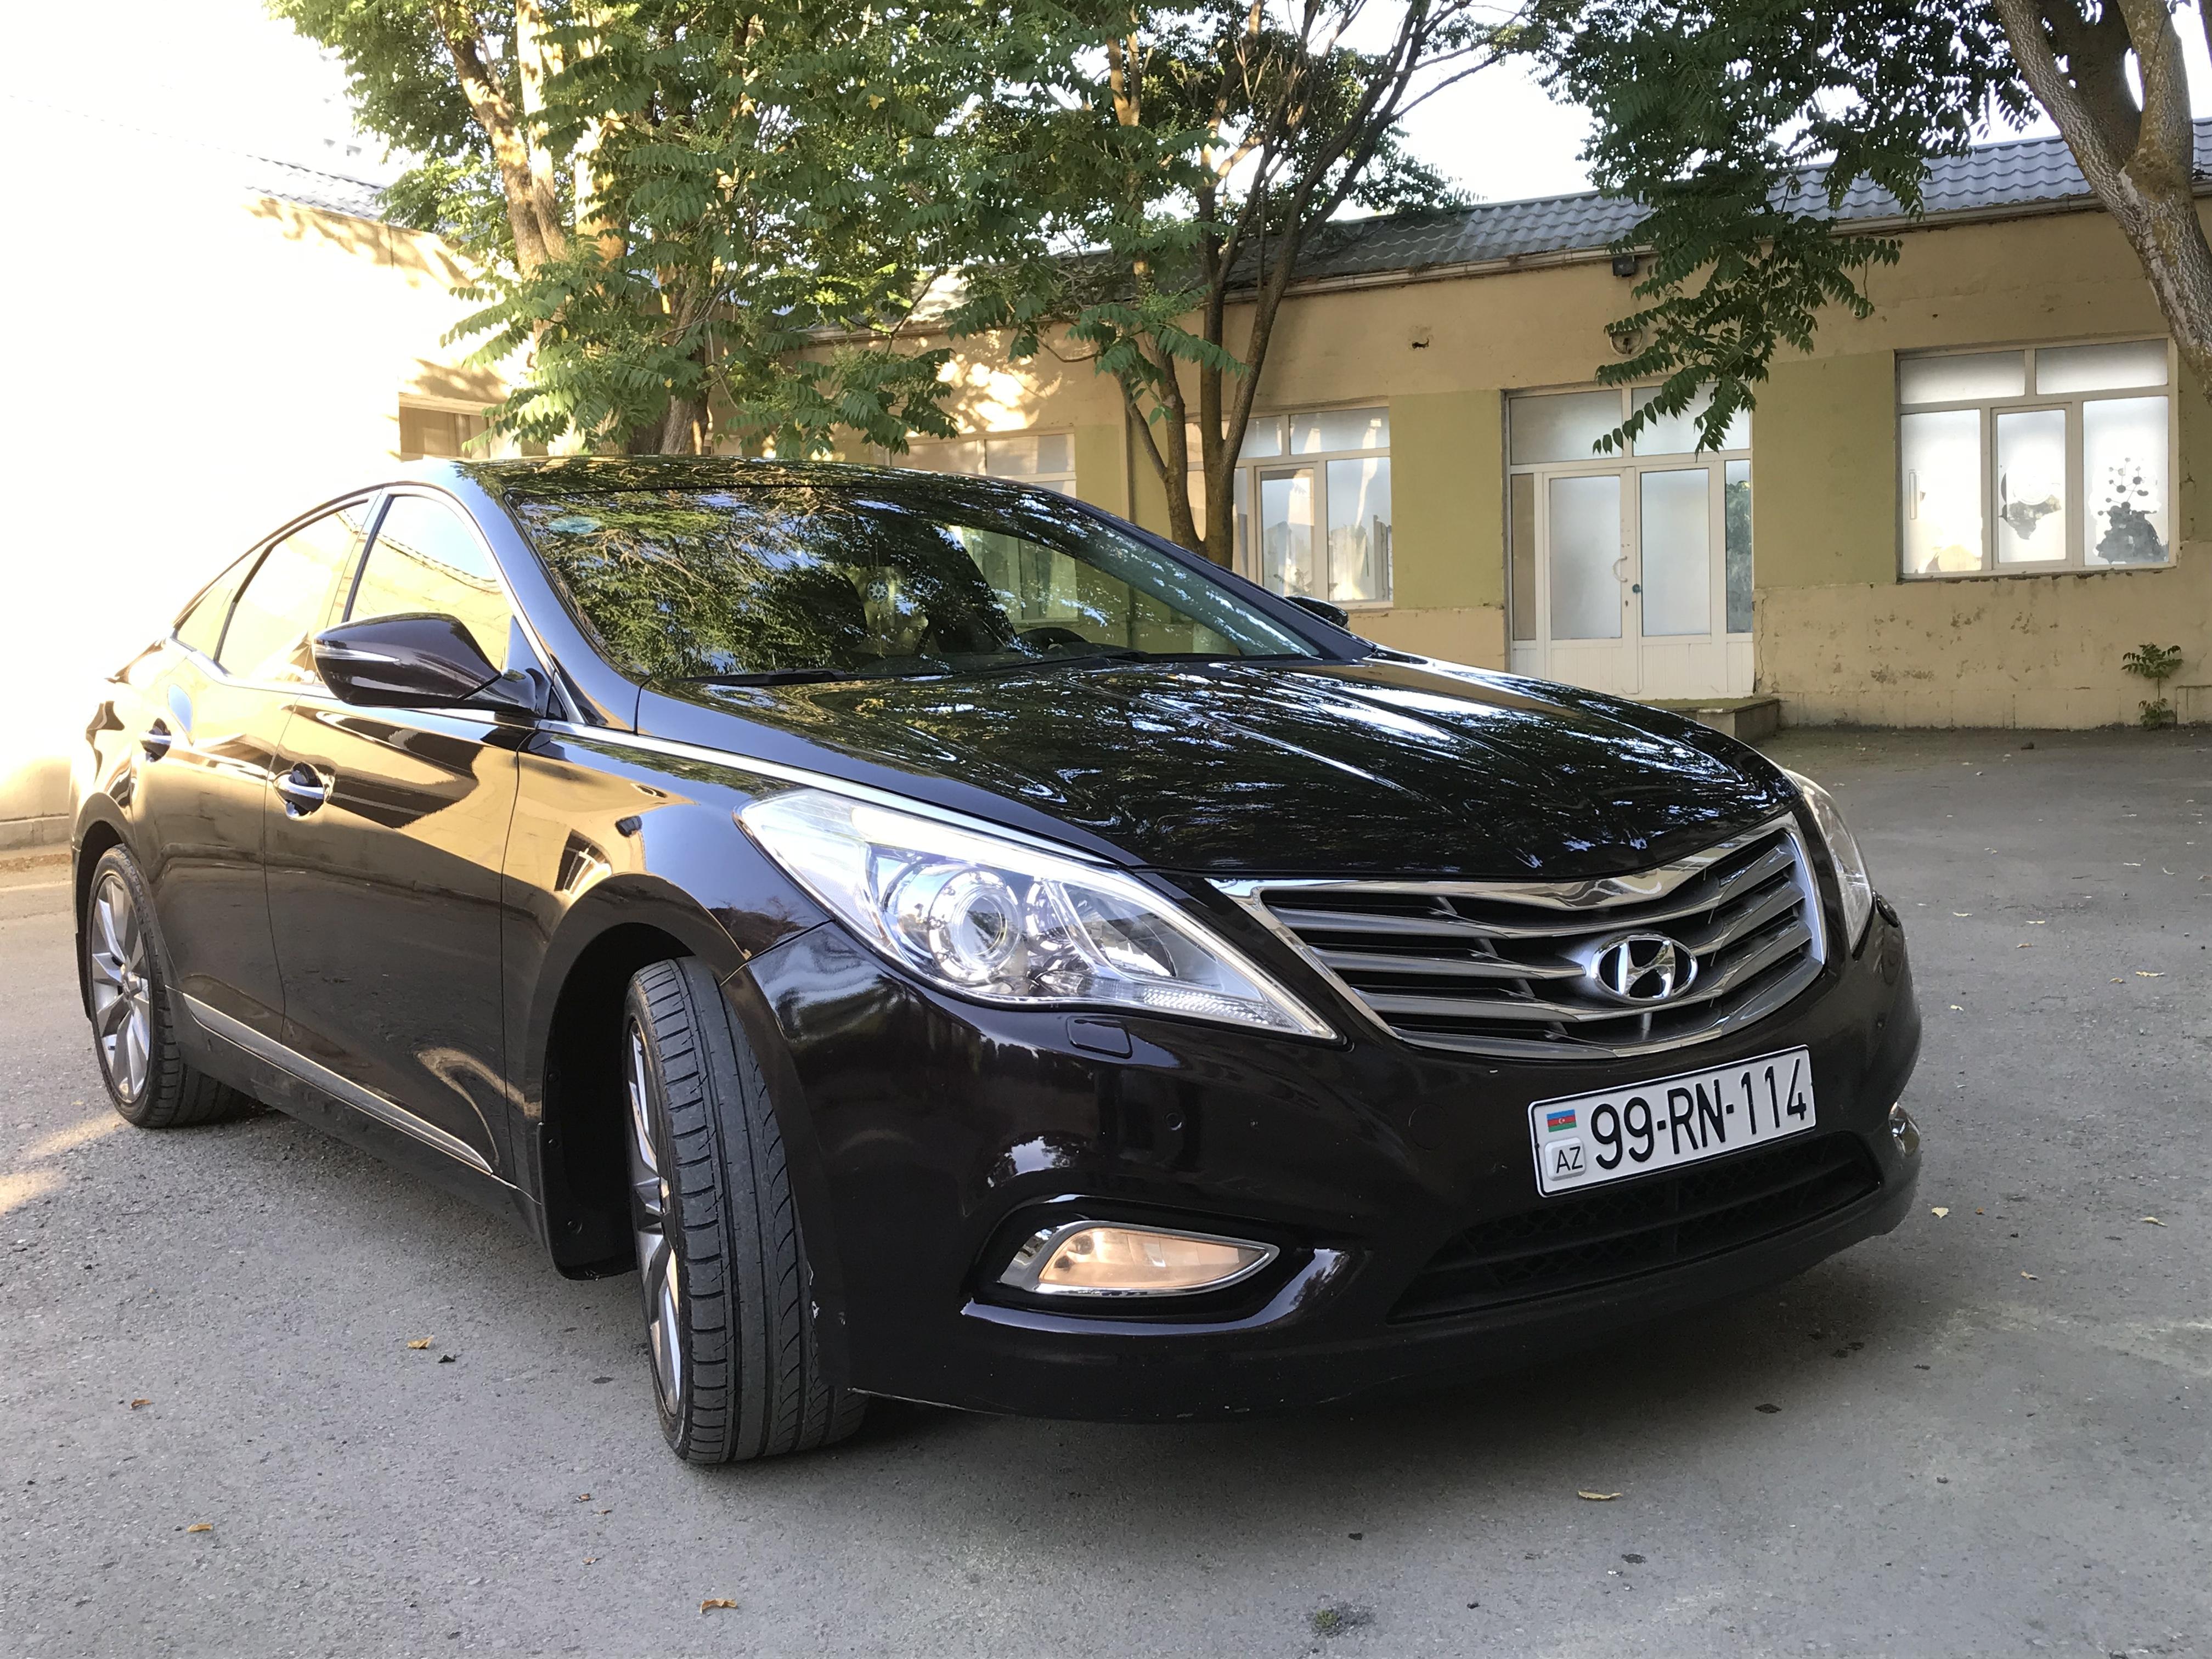 Hyundai Grandeur/Azera 3.0(lt) 2013 İkinci əl  $21800